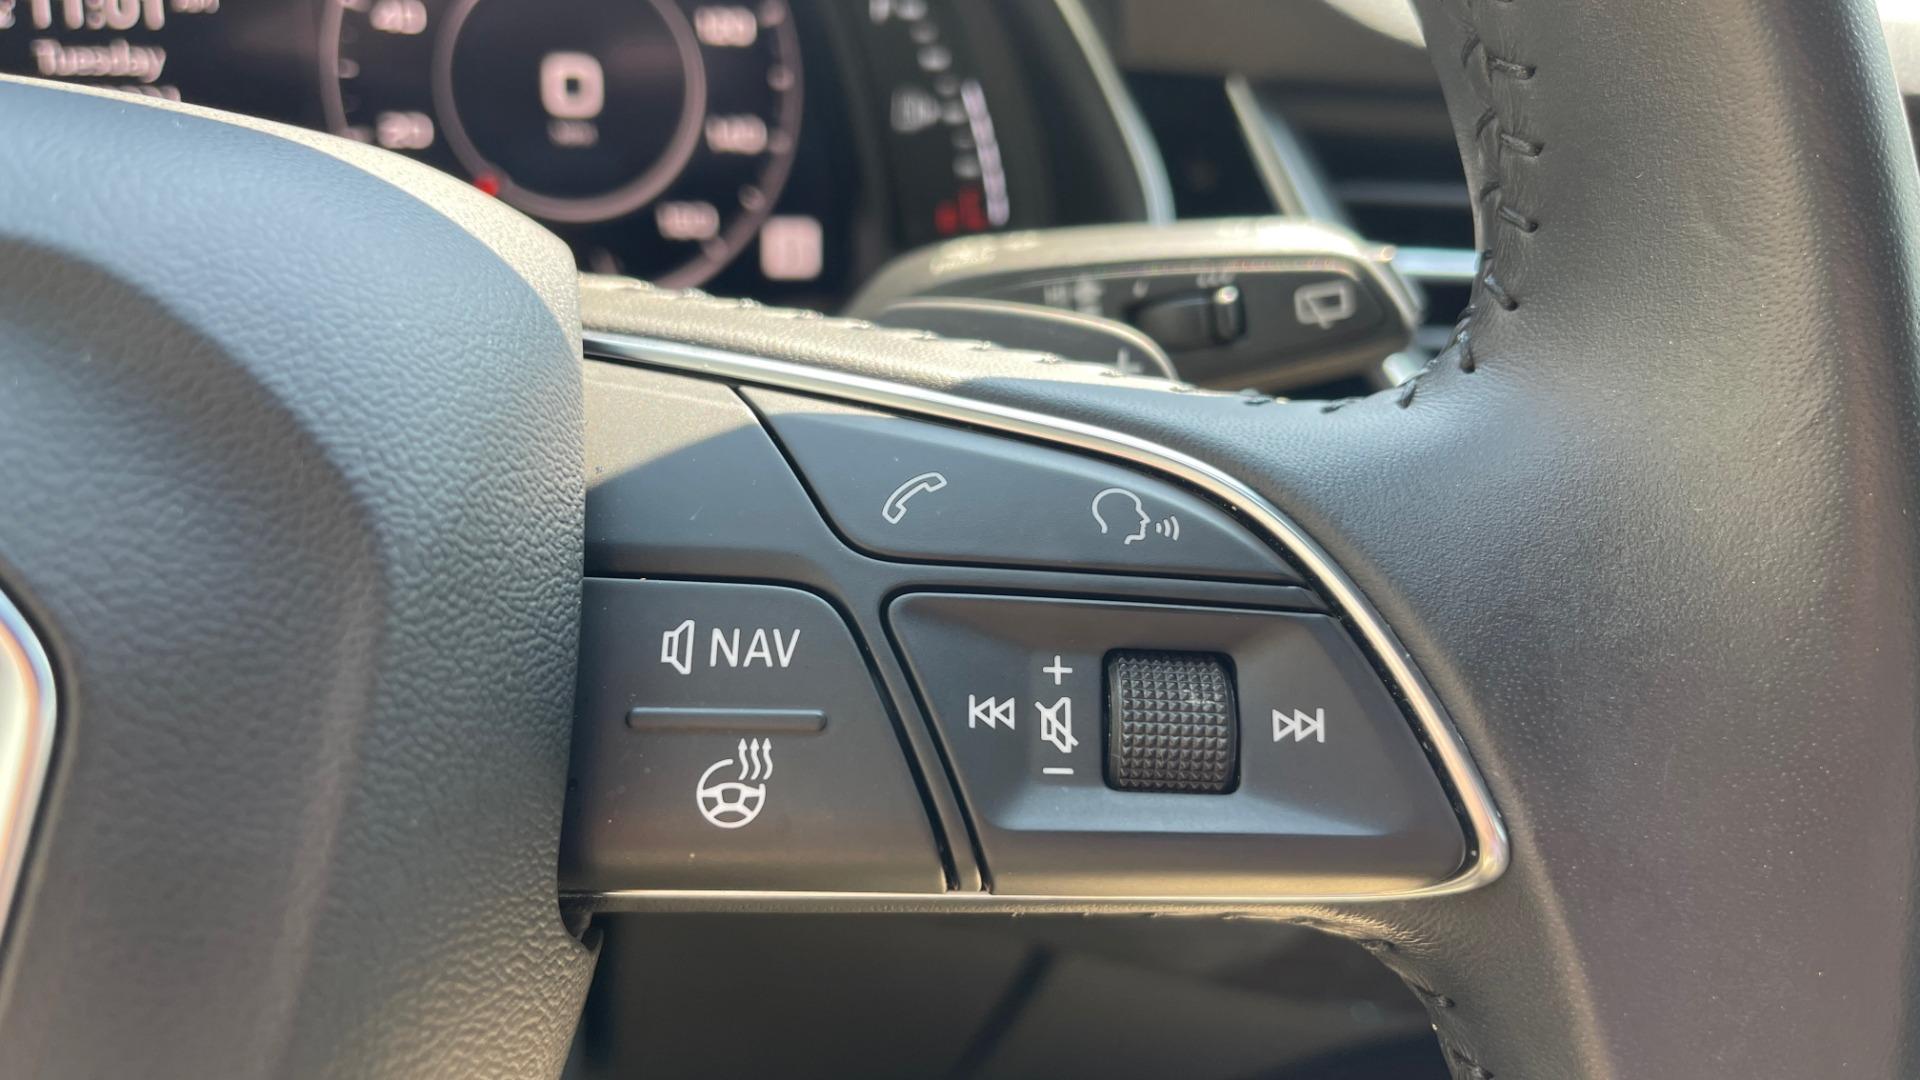 Used 2018 Audi Q7 PRESTIGE TIPTRONIC / NAV / SUNROOF / ADAPTIVE PKG / DRVR ASST / CLD WTHR /  for sale $49,995 at Formula Imports in Charlotte NC 28227 40